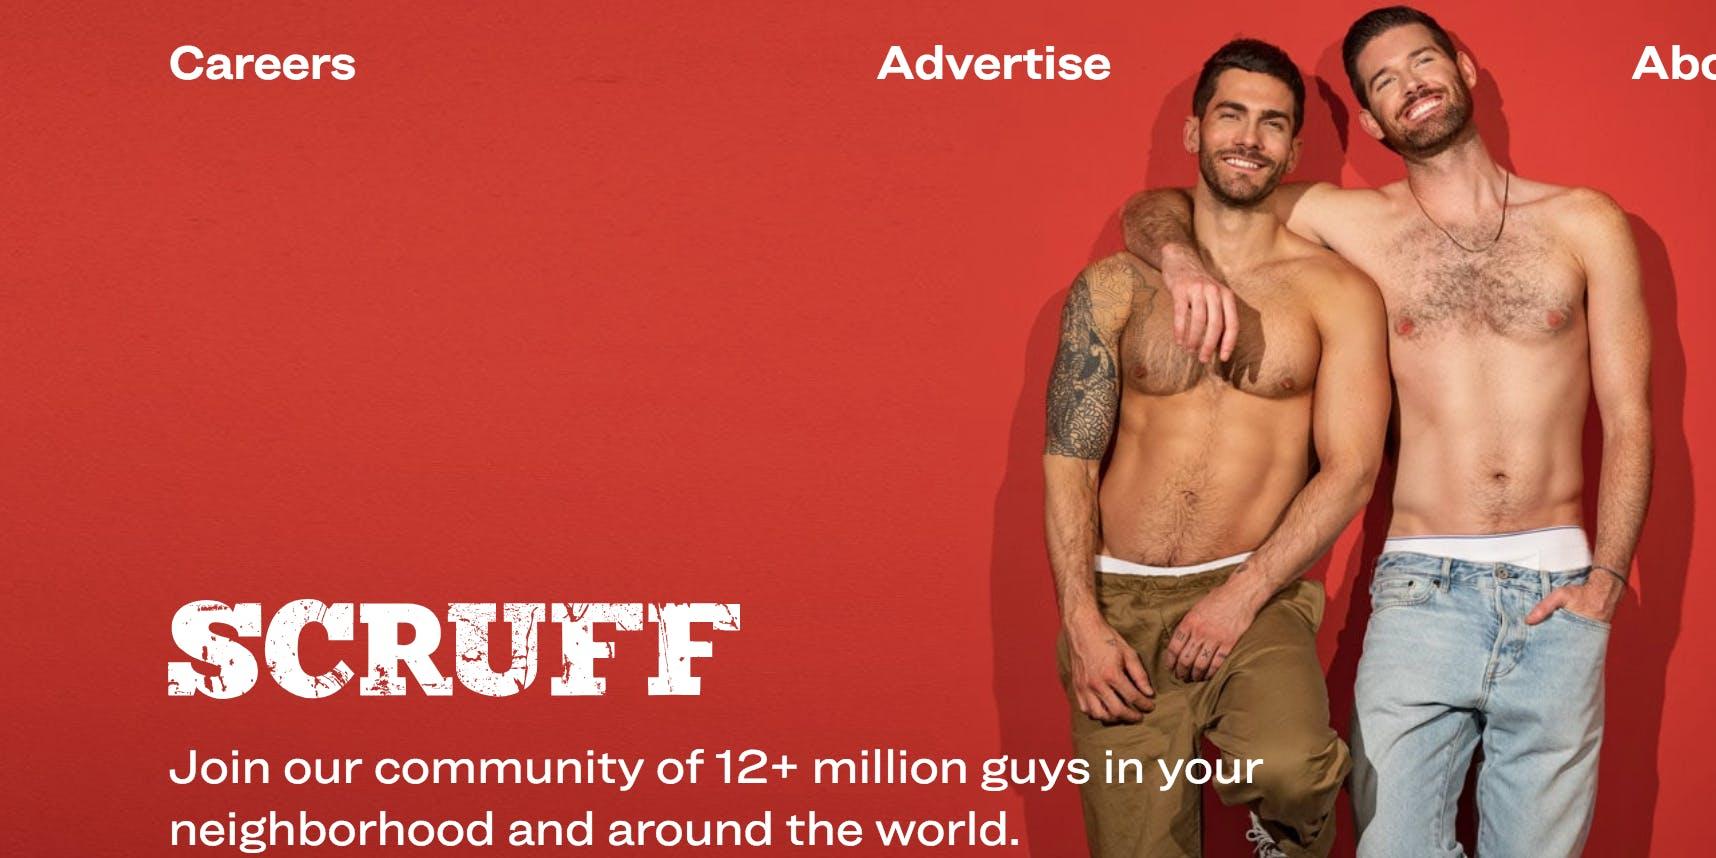 gay dating website : scruff